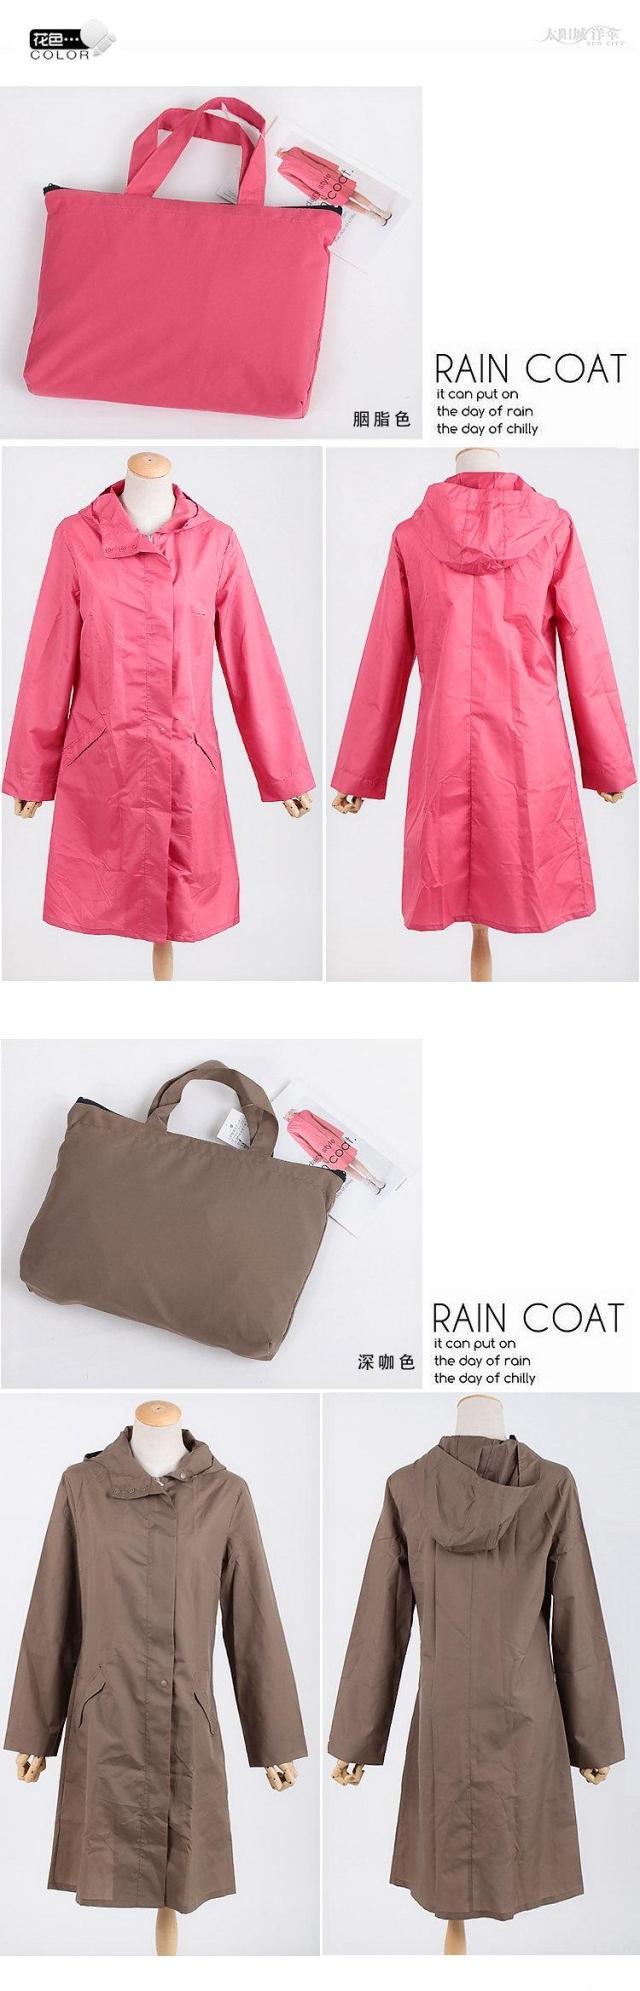 Stylish Raincoats for Spring 2018 m 11